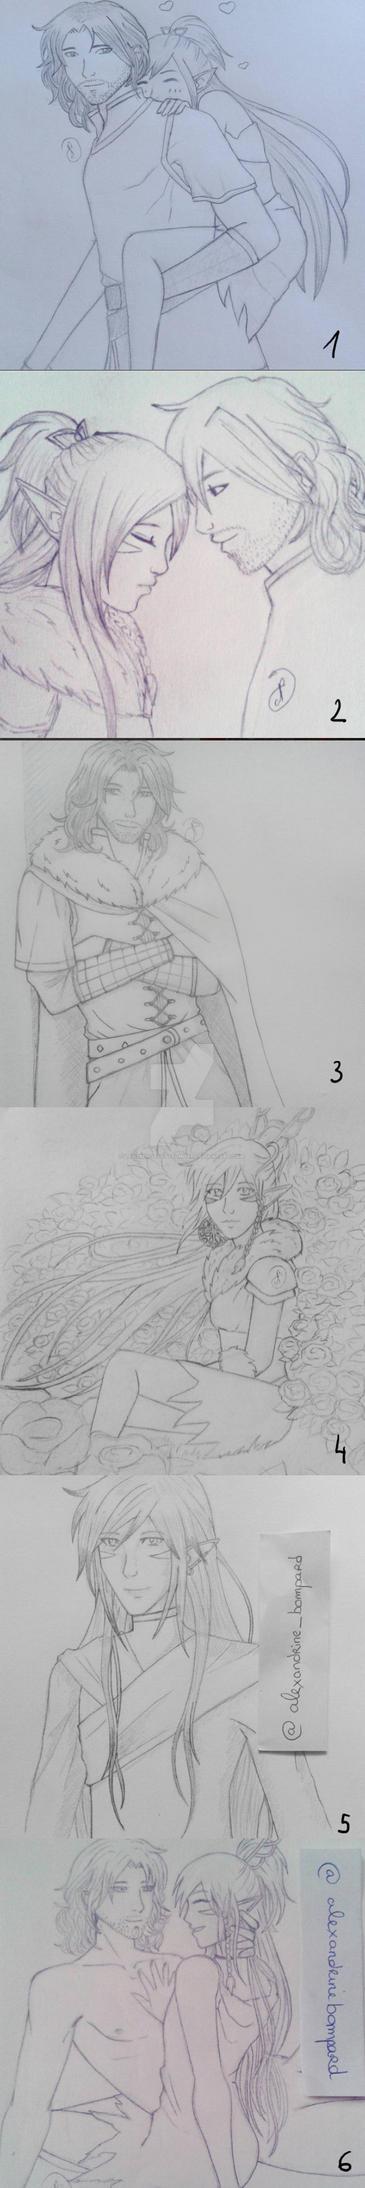 Insta-sketch II by LadySlyOfCastelmore